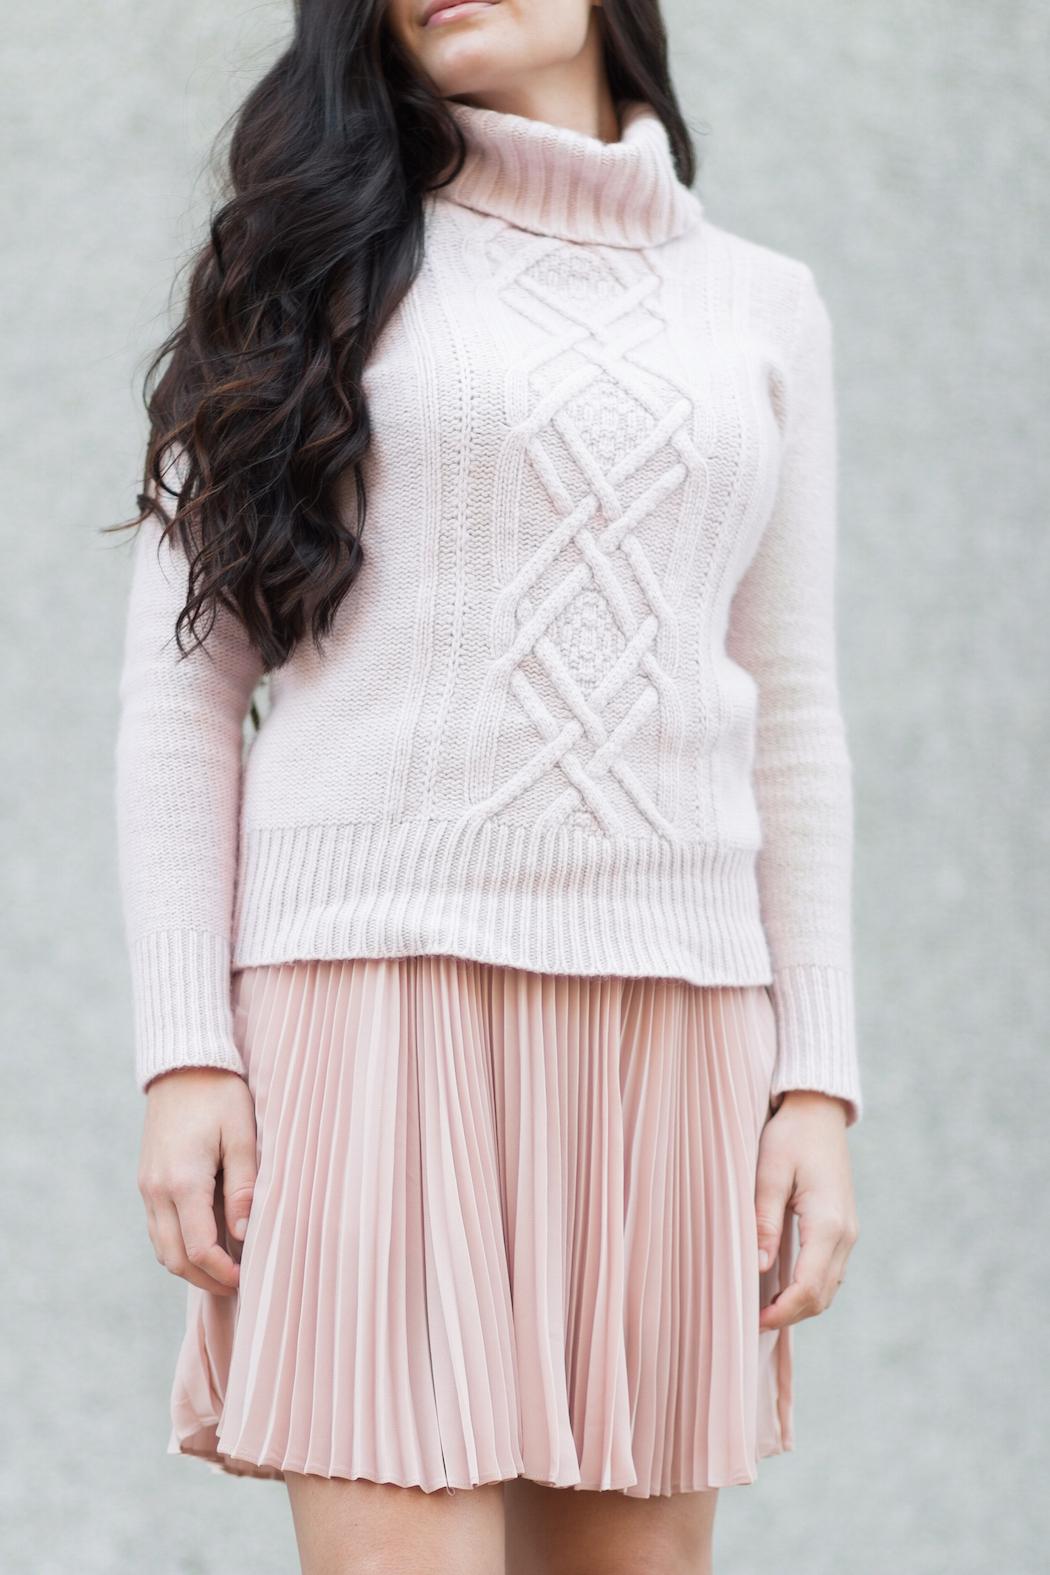 blush sweater + blush skirt